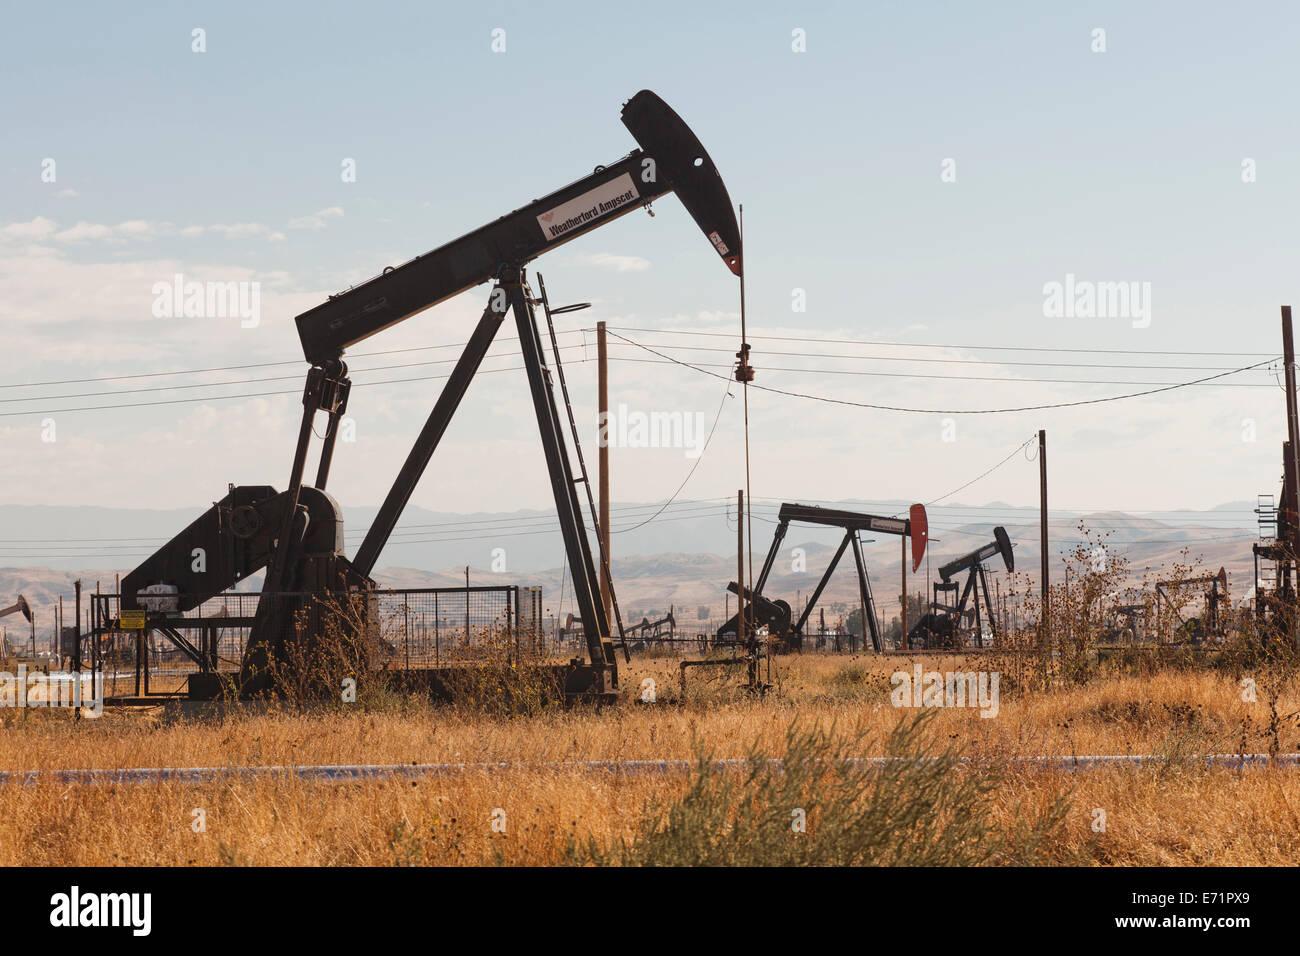 Oil pumpjacks - Kern River Oil Field, Coalinga, California USA - Stock Image